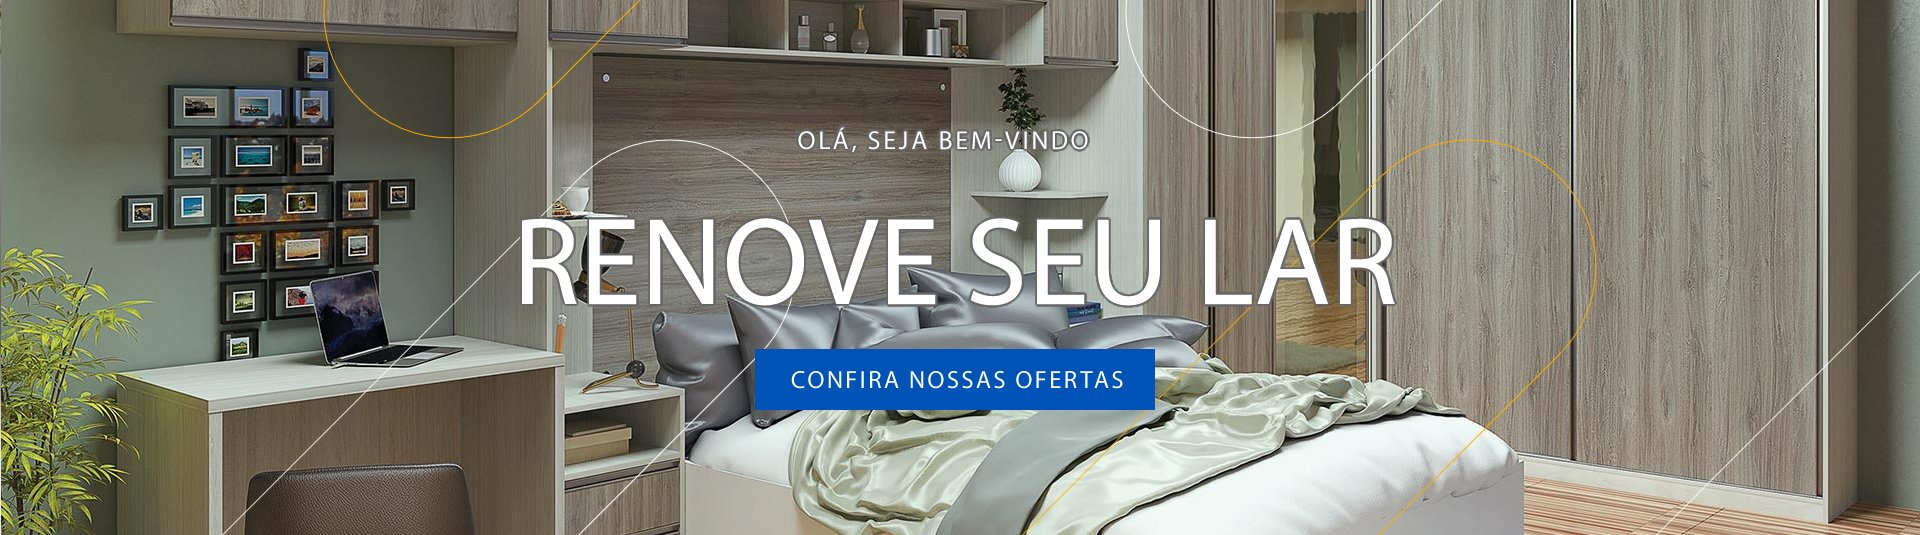 banner01 dormitorio